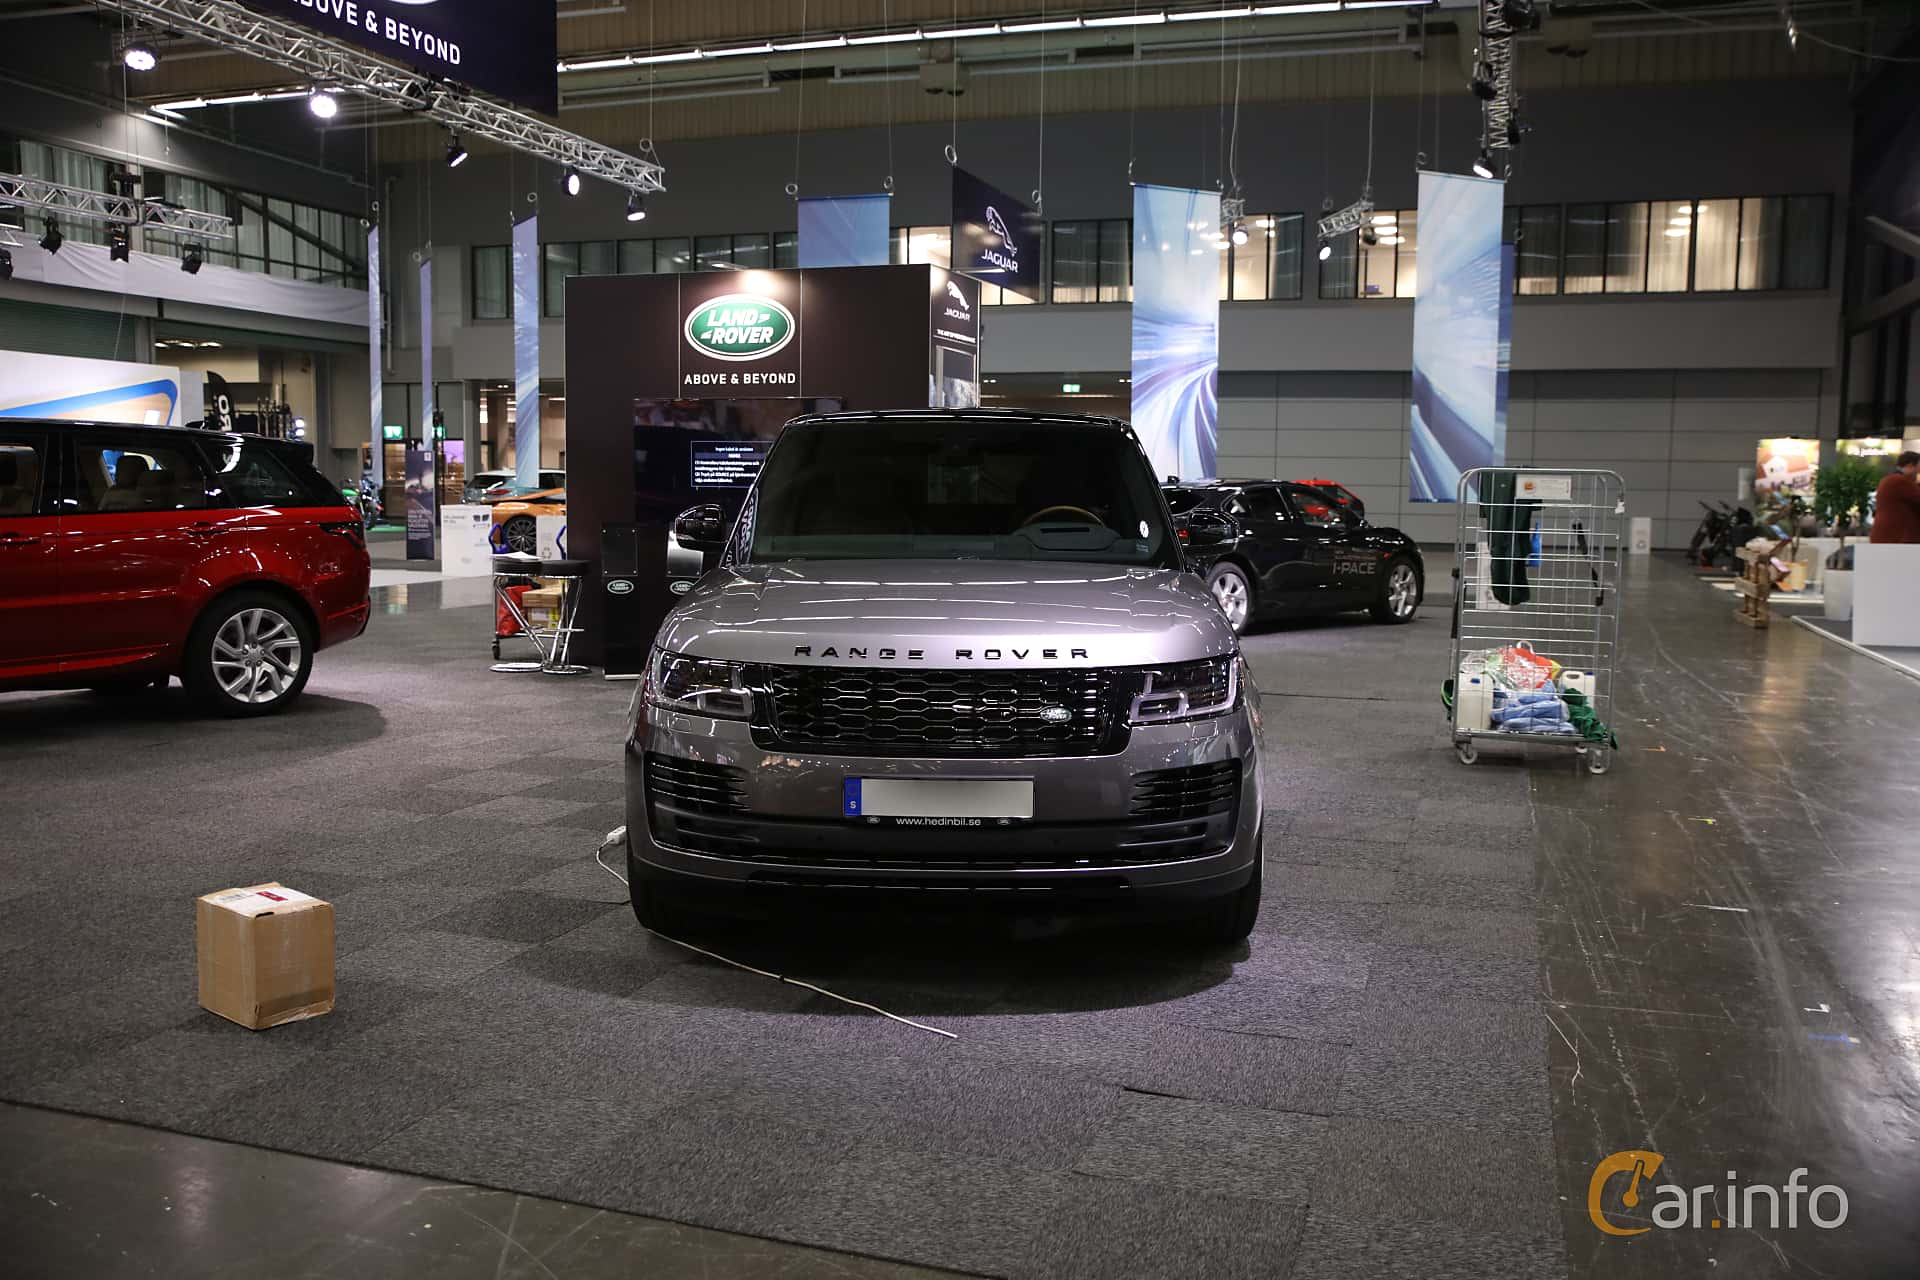 Land Rover Range Rover P400e 2.0 + 13.1 kWh 4WD Automatic, 404hp, 2019 at eCar Expo Göteborg 2018